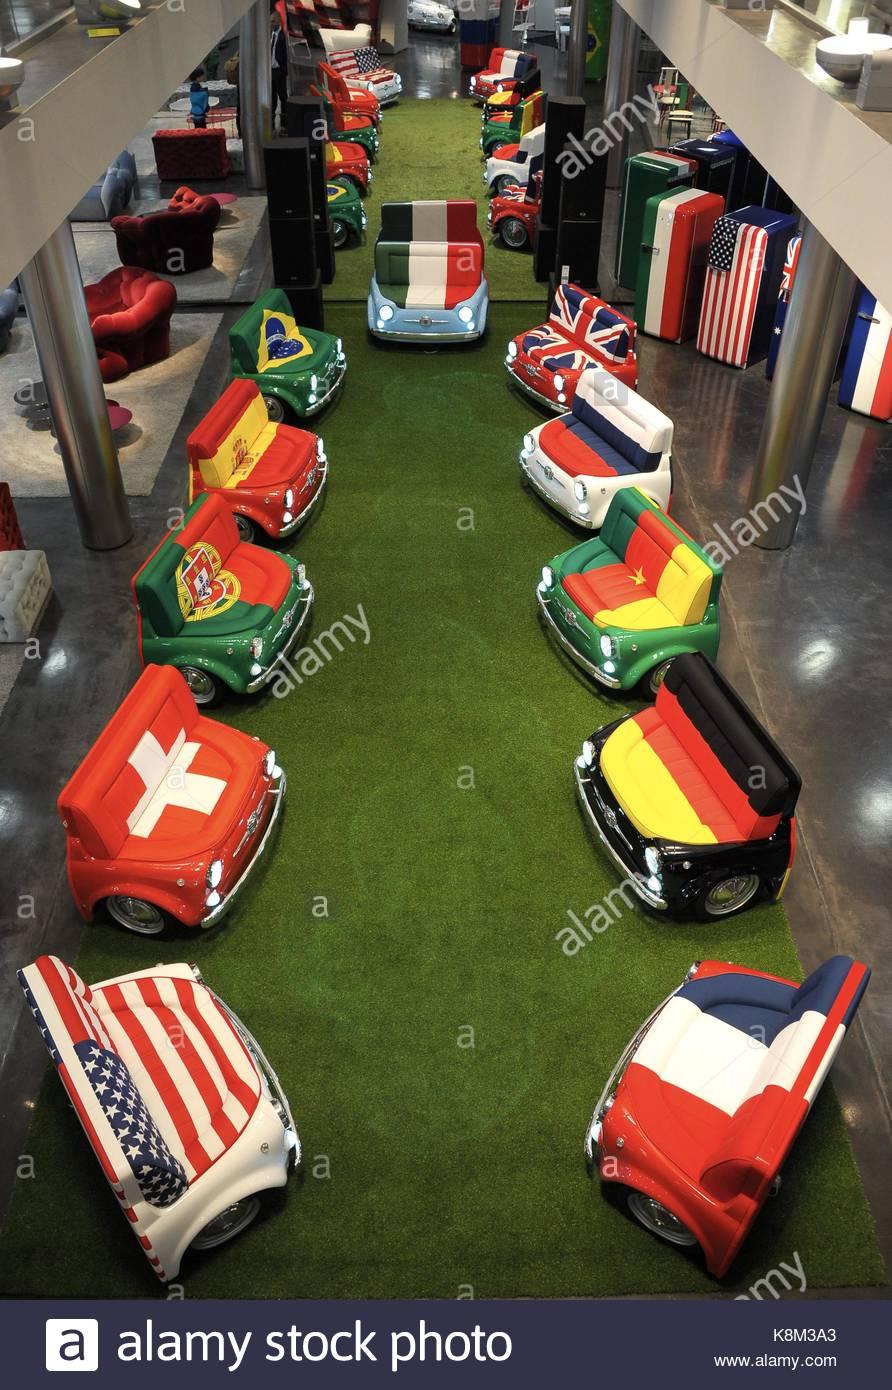 Meritalia Lapo Elkann Presenta Officina : Fiat showroom stock photos images